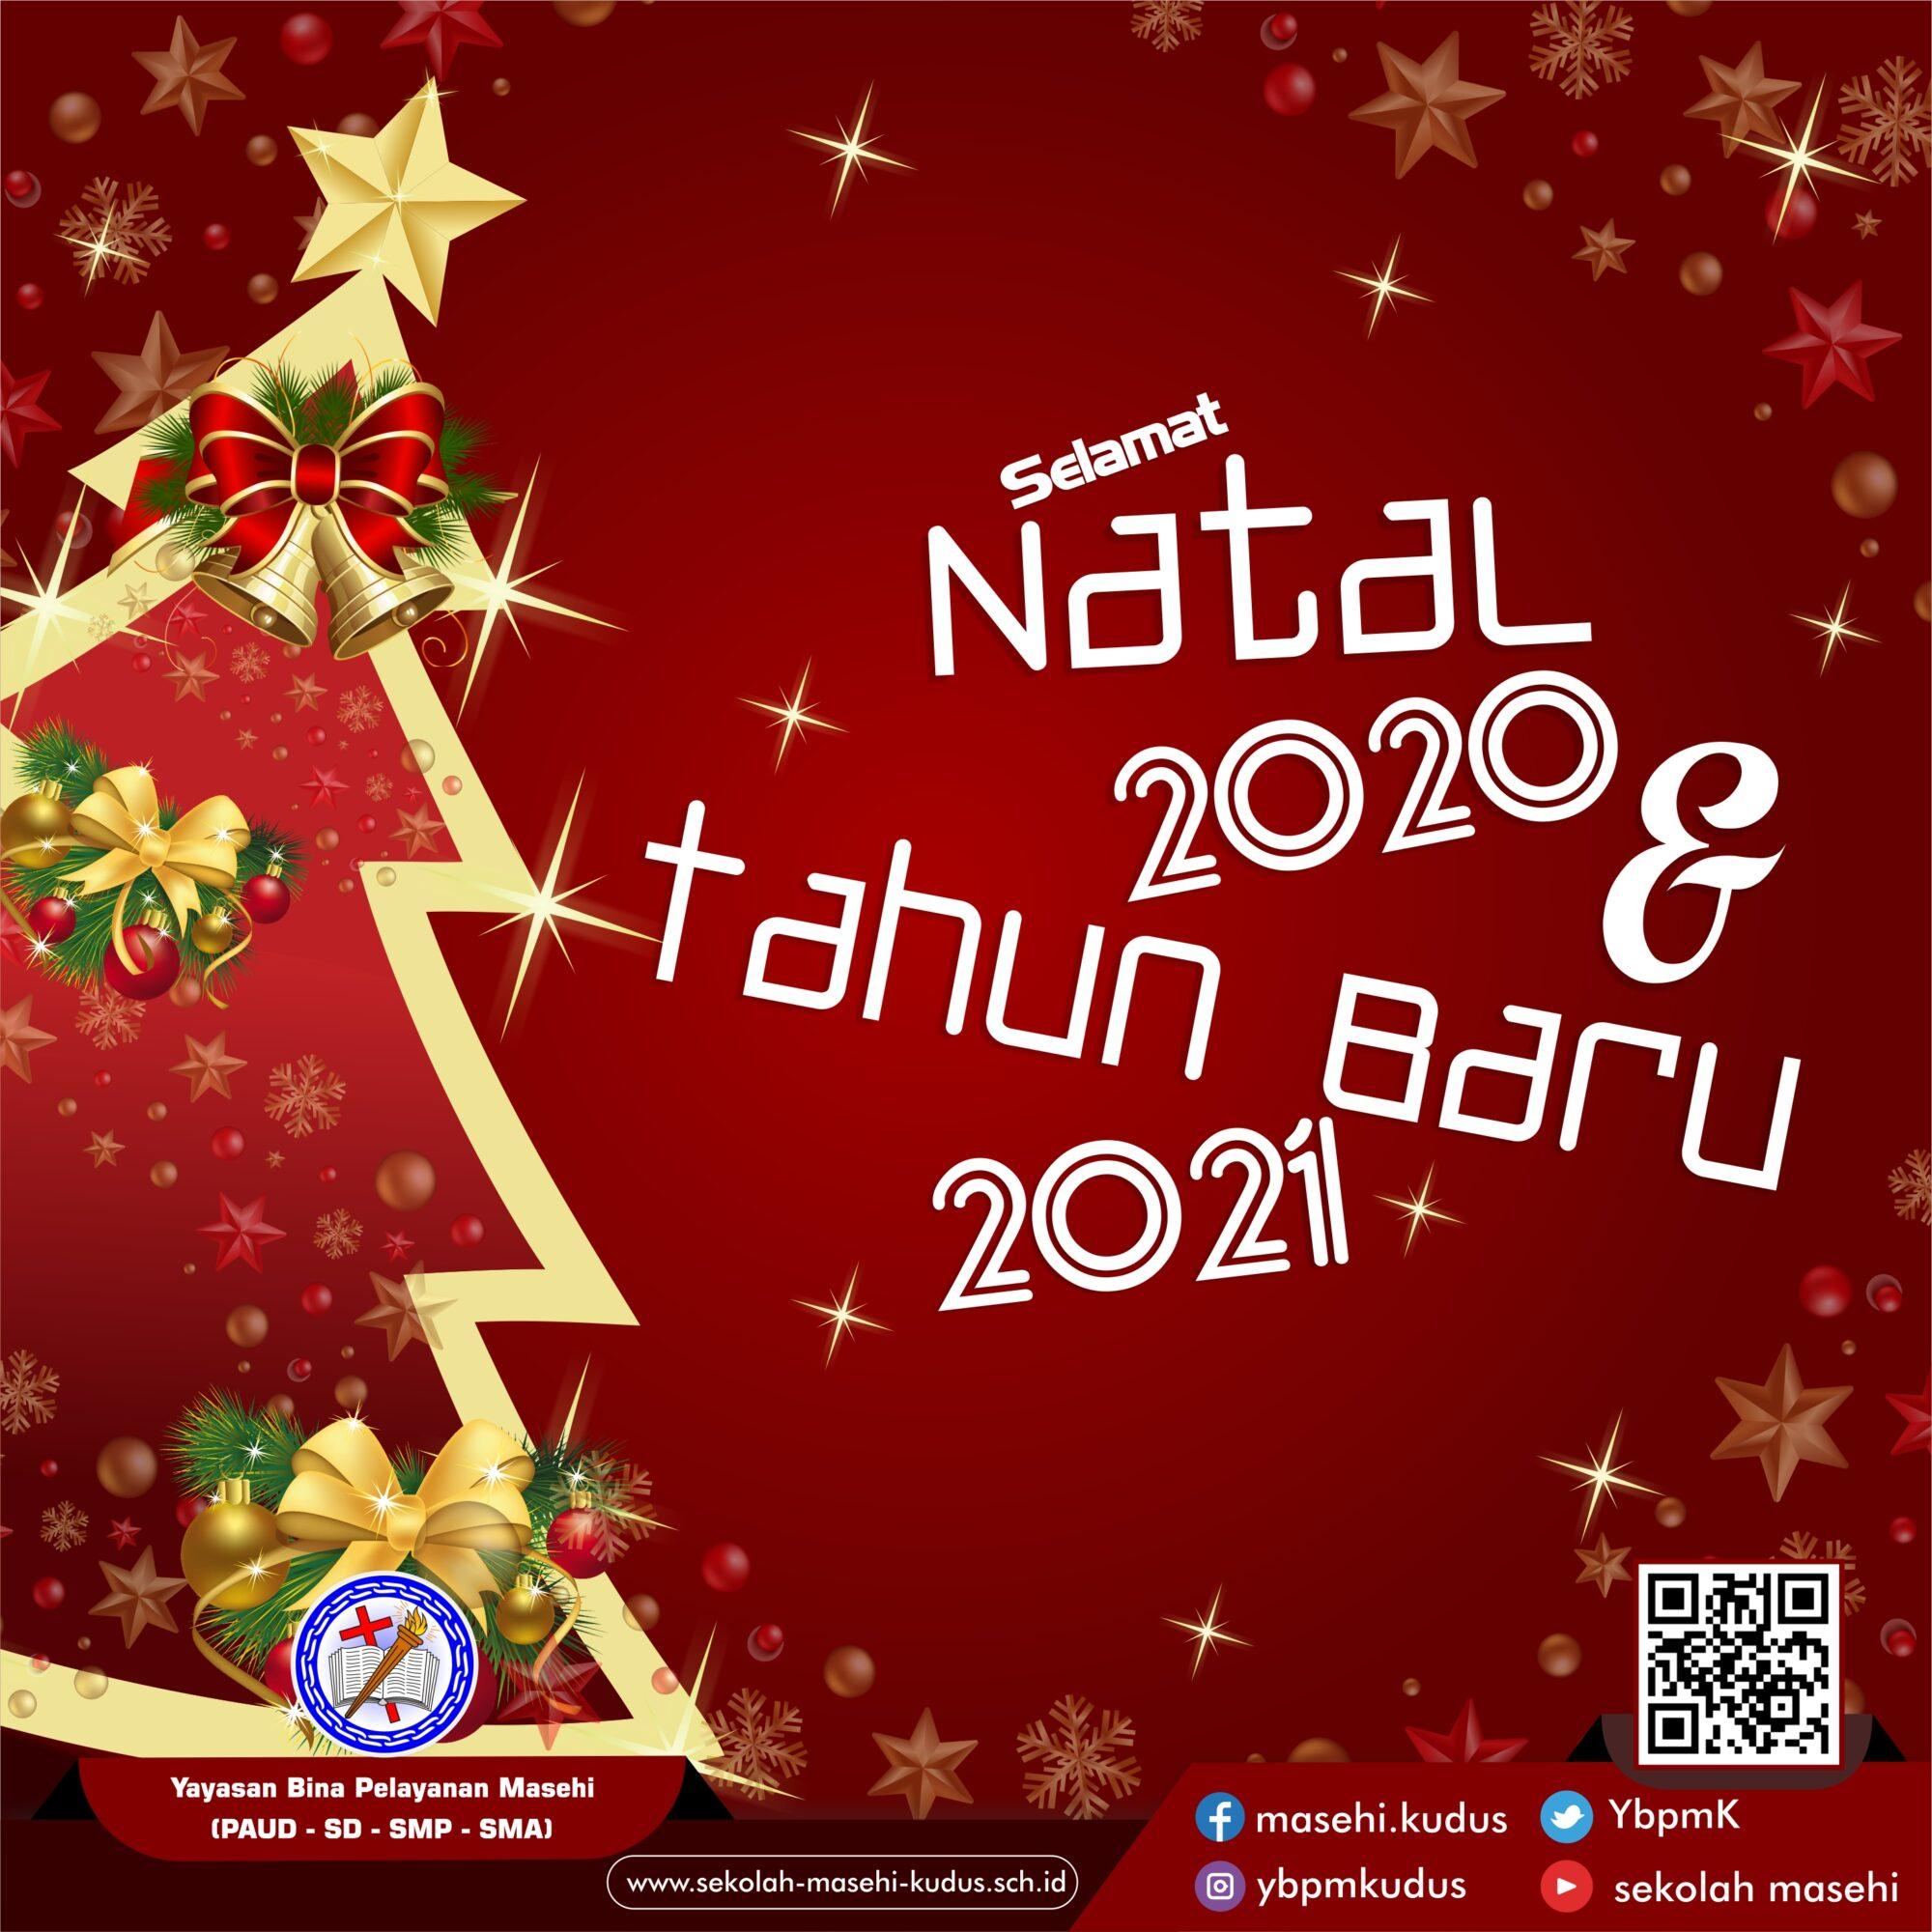 Selamat Hari Natal